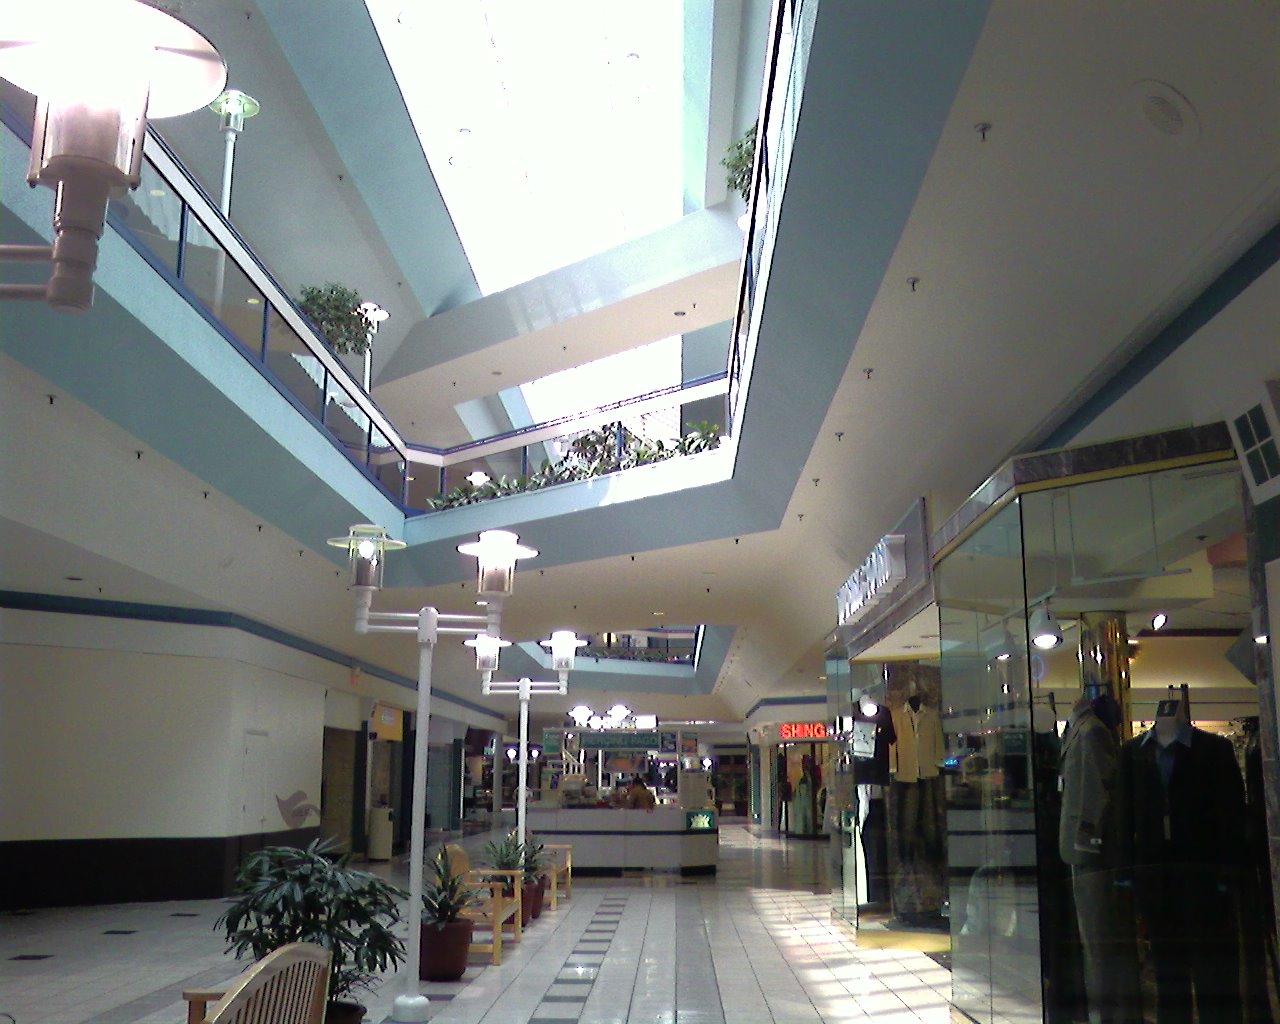 Labelscar The Retail History BlogLaurel Mall Laurel